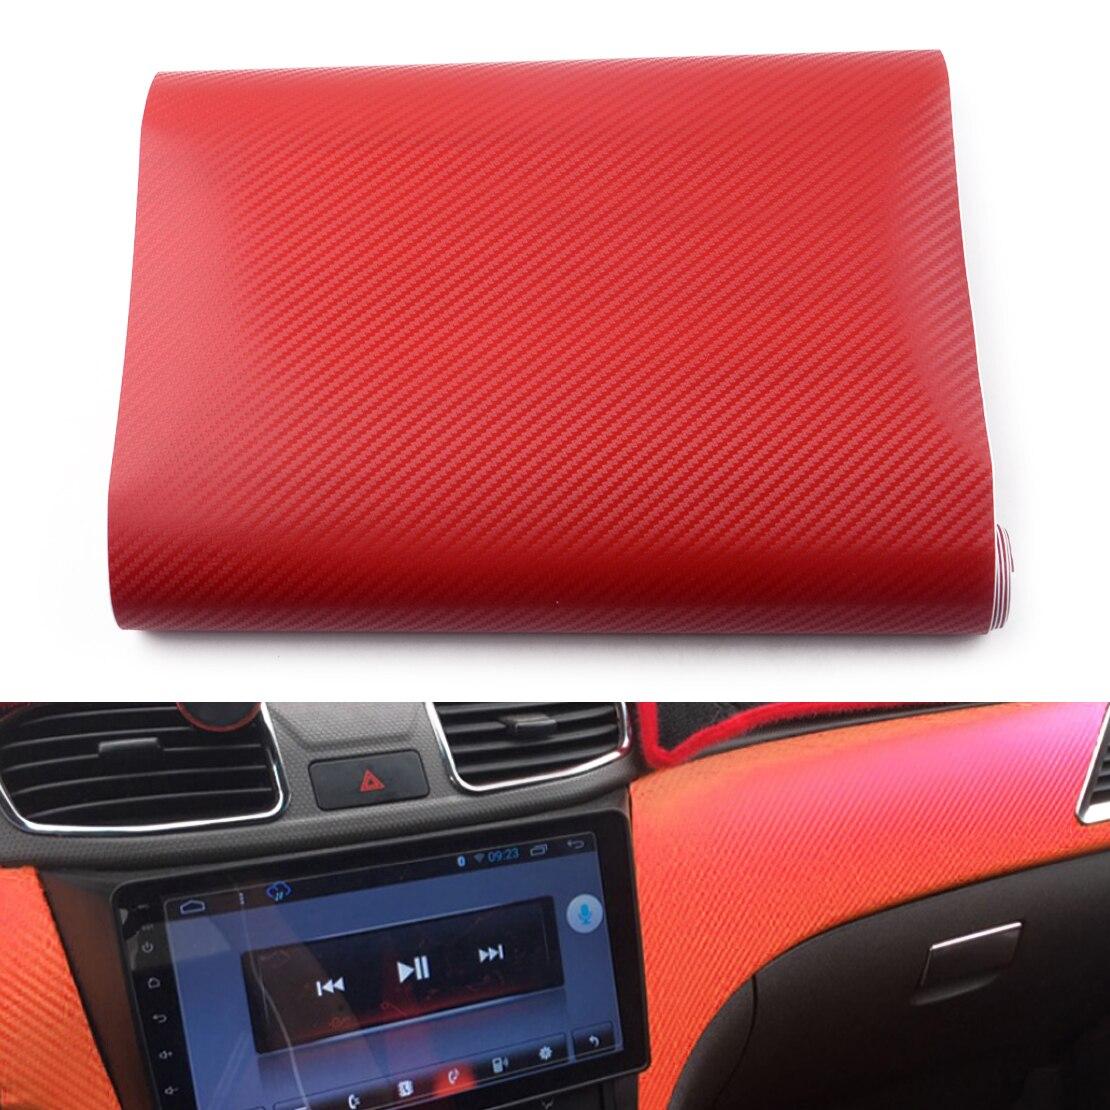 DWCX Universal Car SUV Red PVC Carbon Fiber Vinyl Interior Roll Accessories Panel Wrap Sticker 127x30cm